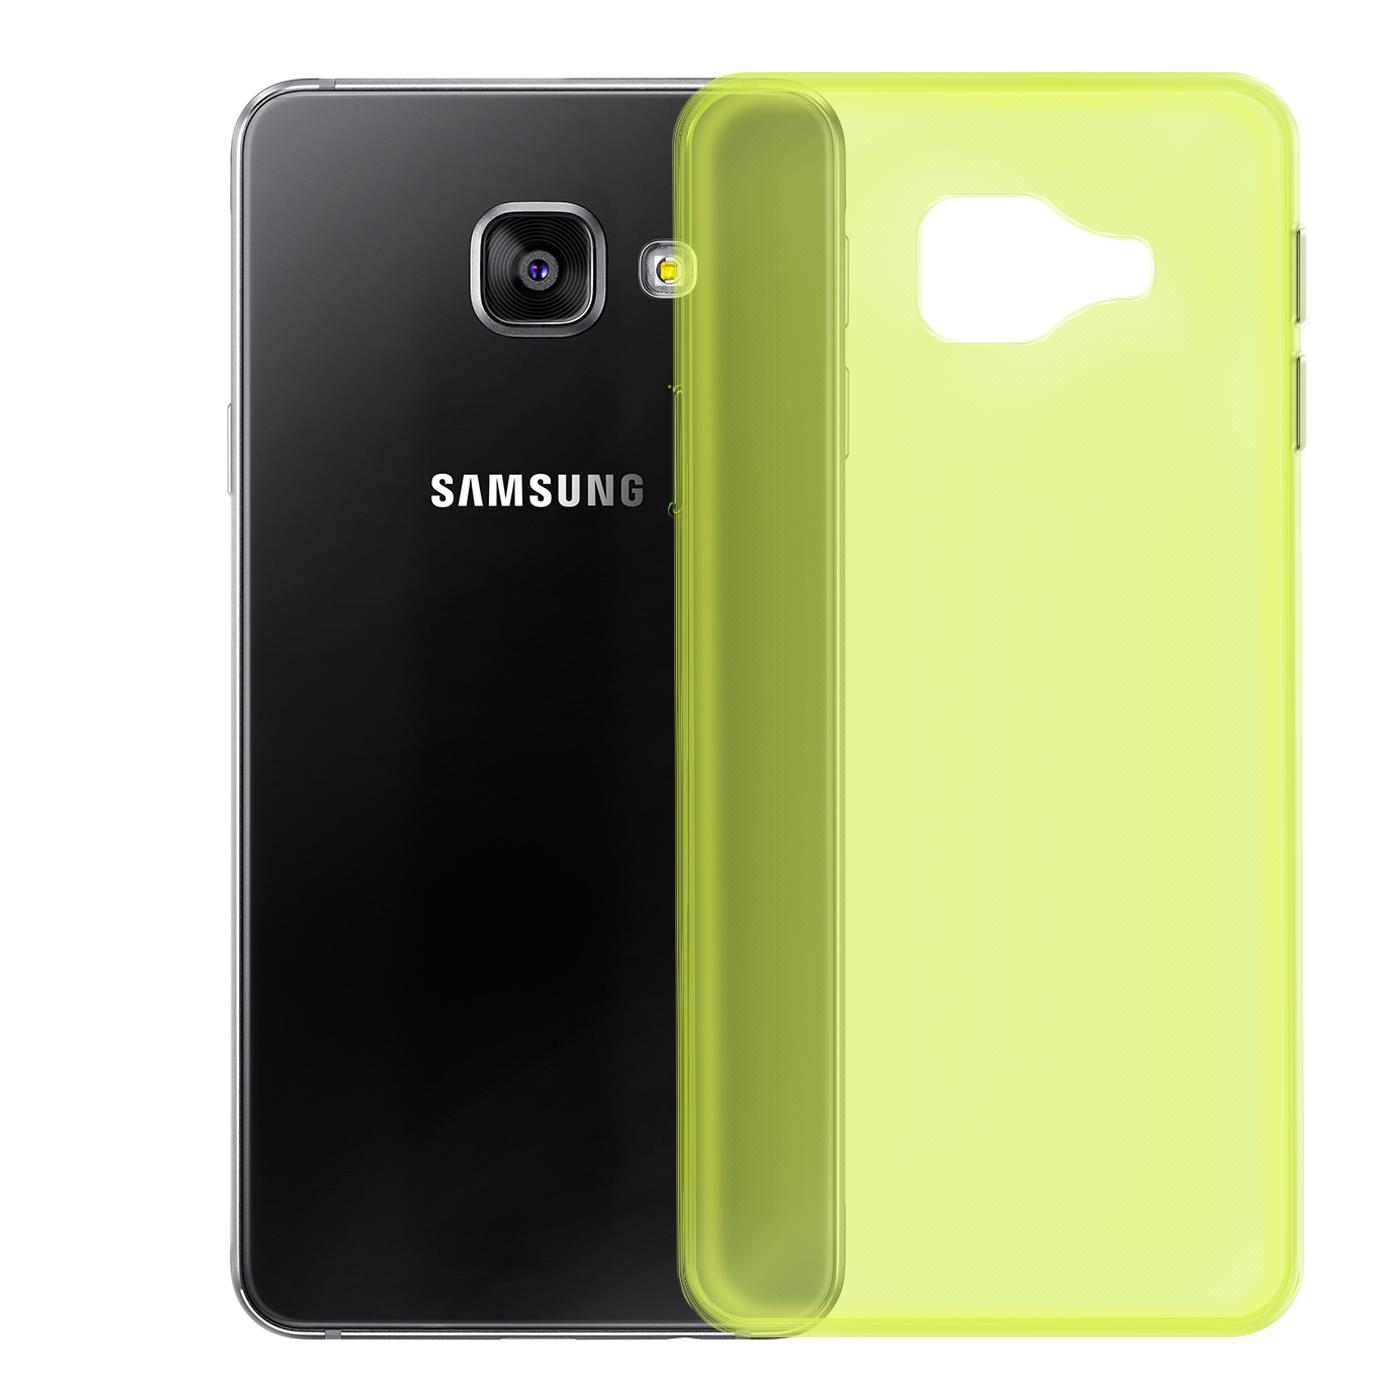 Samsung-Galaxy-a3-2016-Thin-Silikon-Klar-Case-Cover-Ultra-Slim-Stossfeste-Gel Indexbild 12